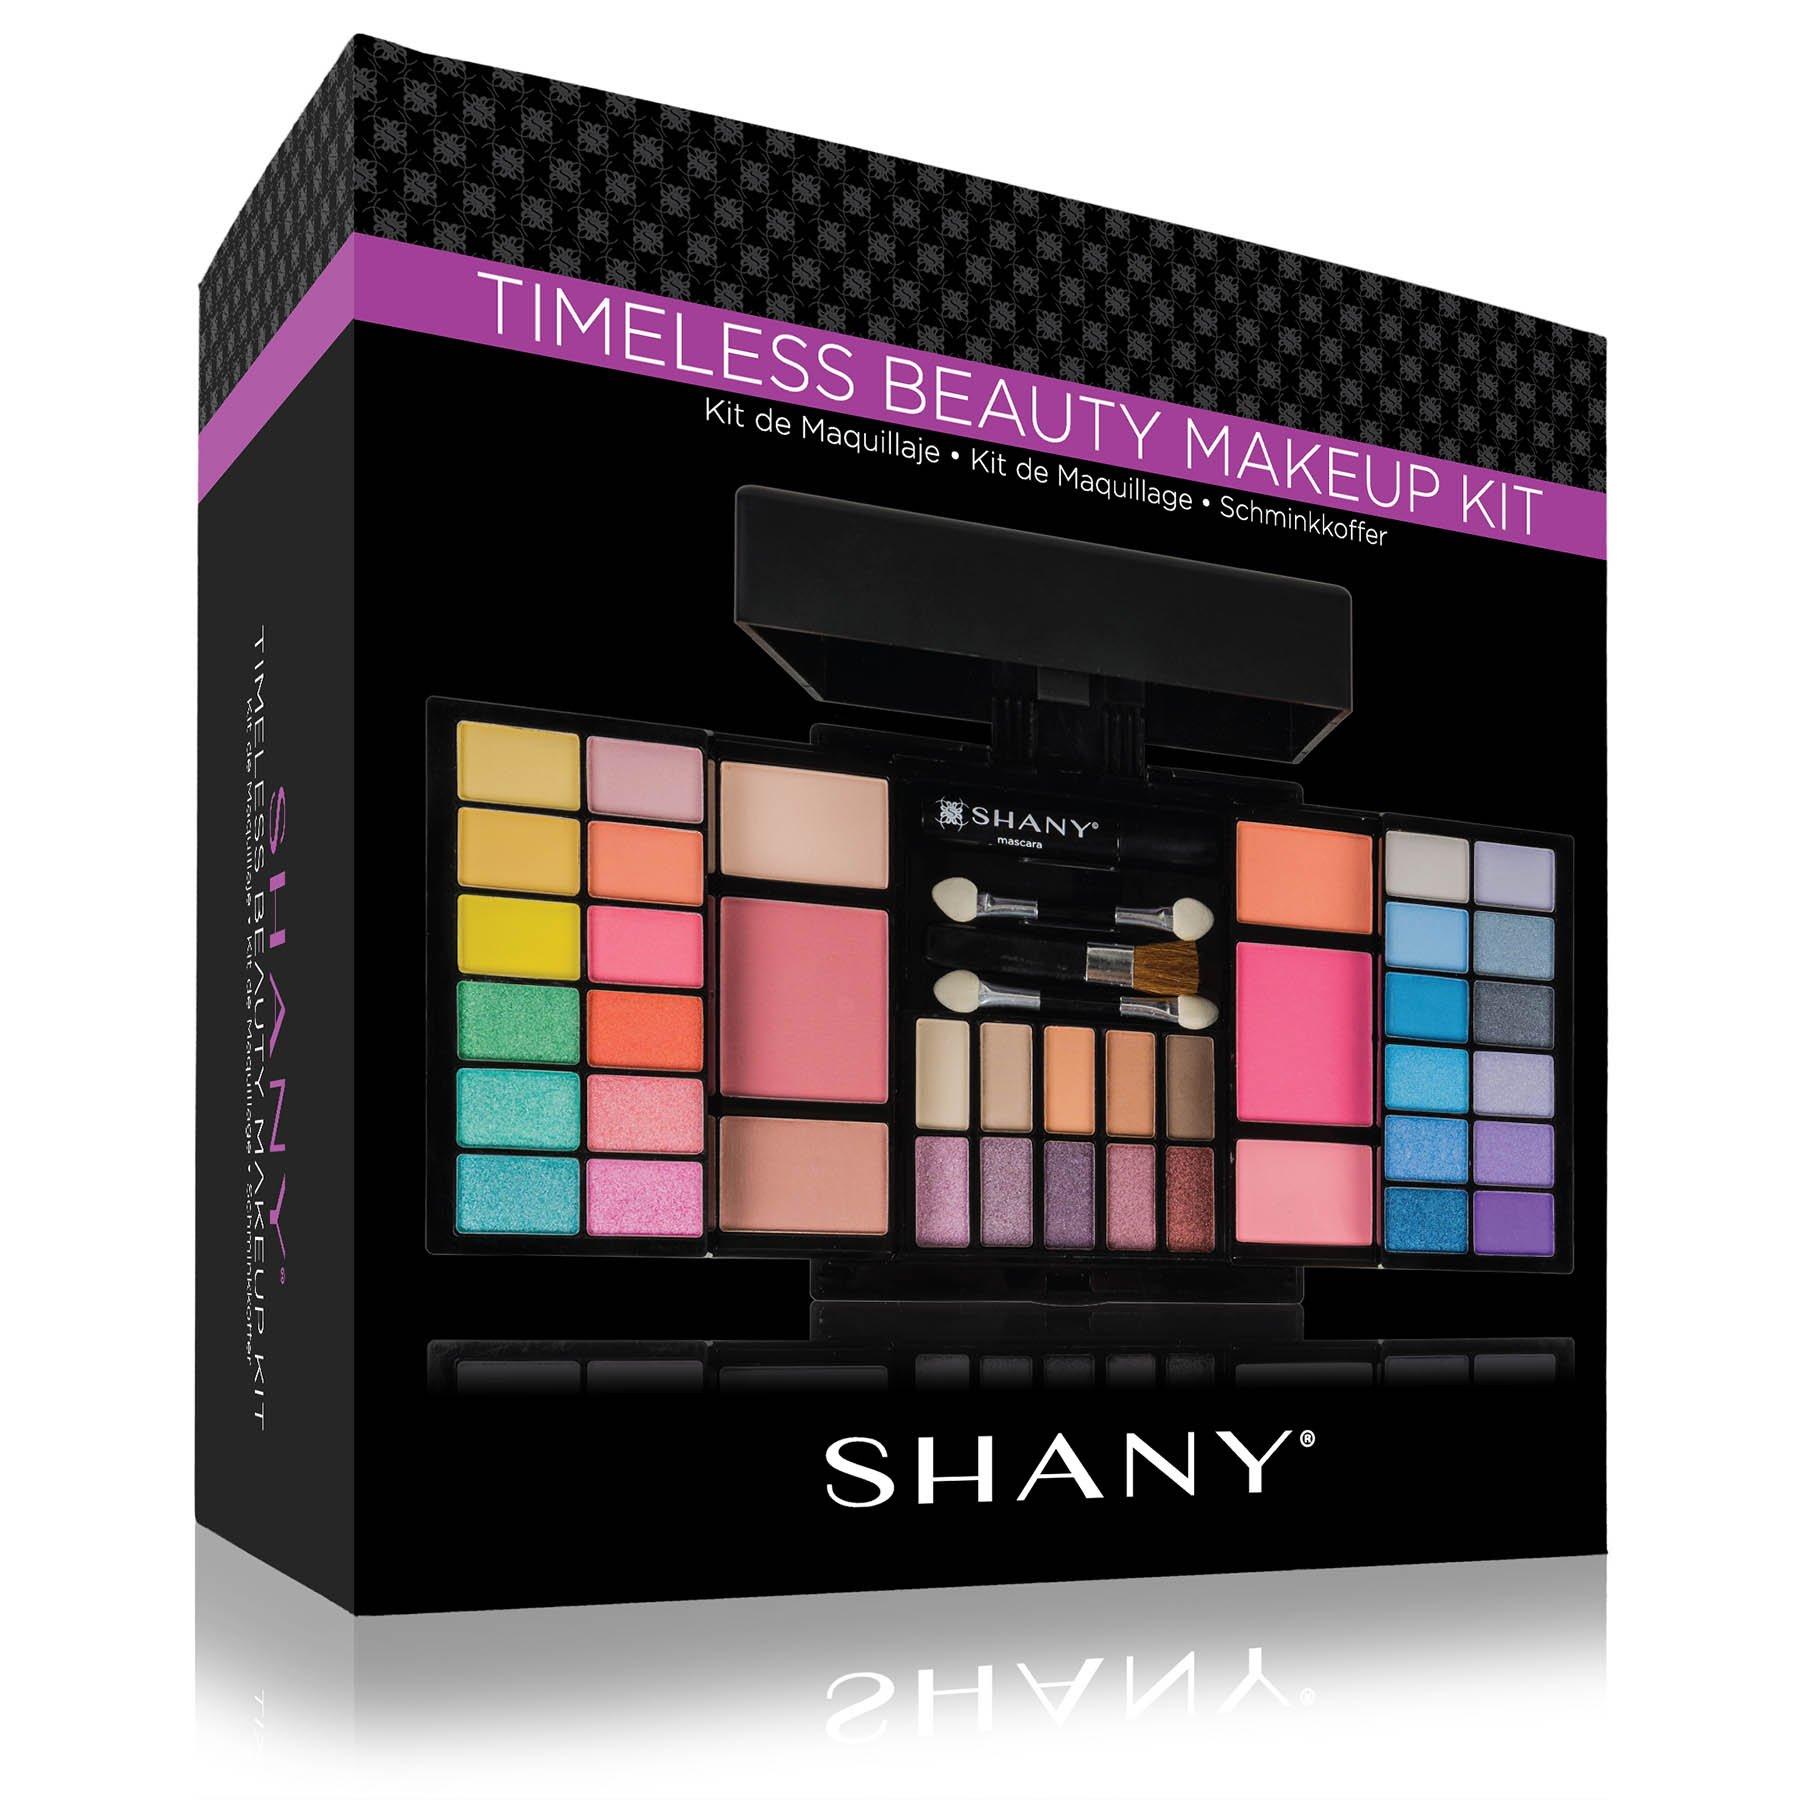 SHANY 'Timeless Beauty' Makeup Kit, Multi by SHANY Cosmetics (Image #5)